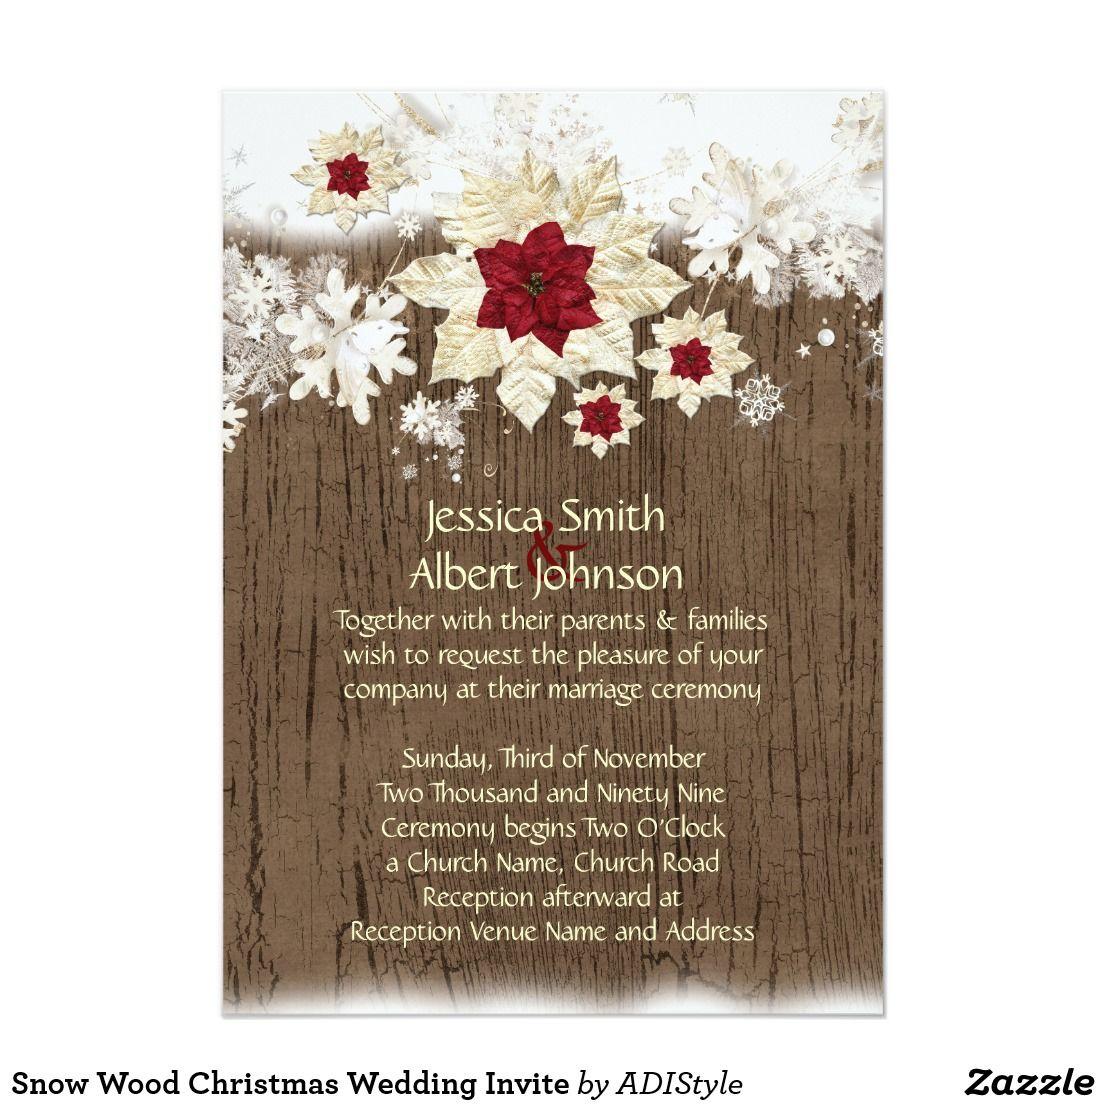 Snow Wood Christmas Wedding Invite Luxury style. It\'s romantic and ...